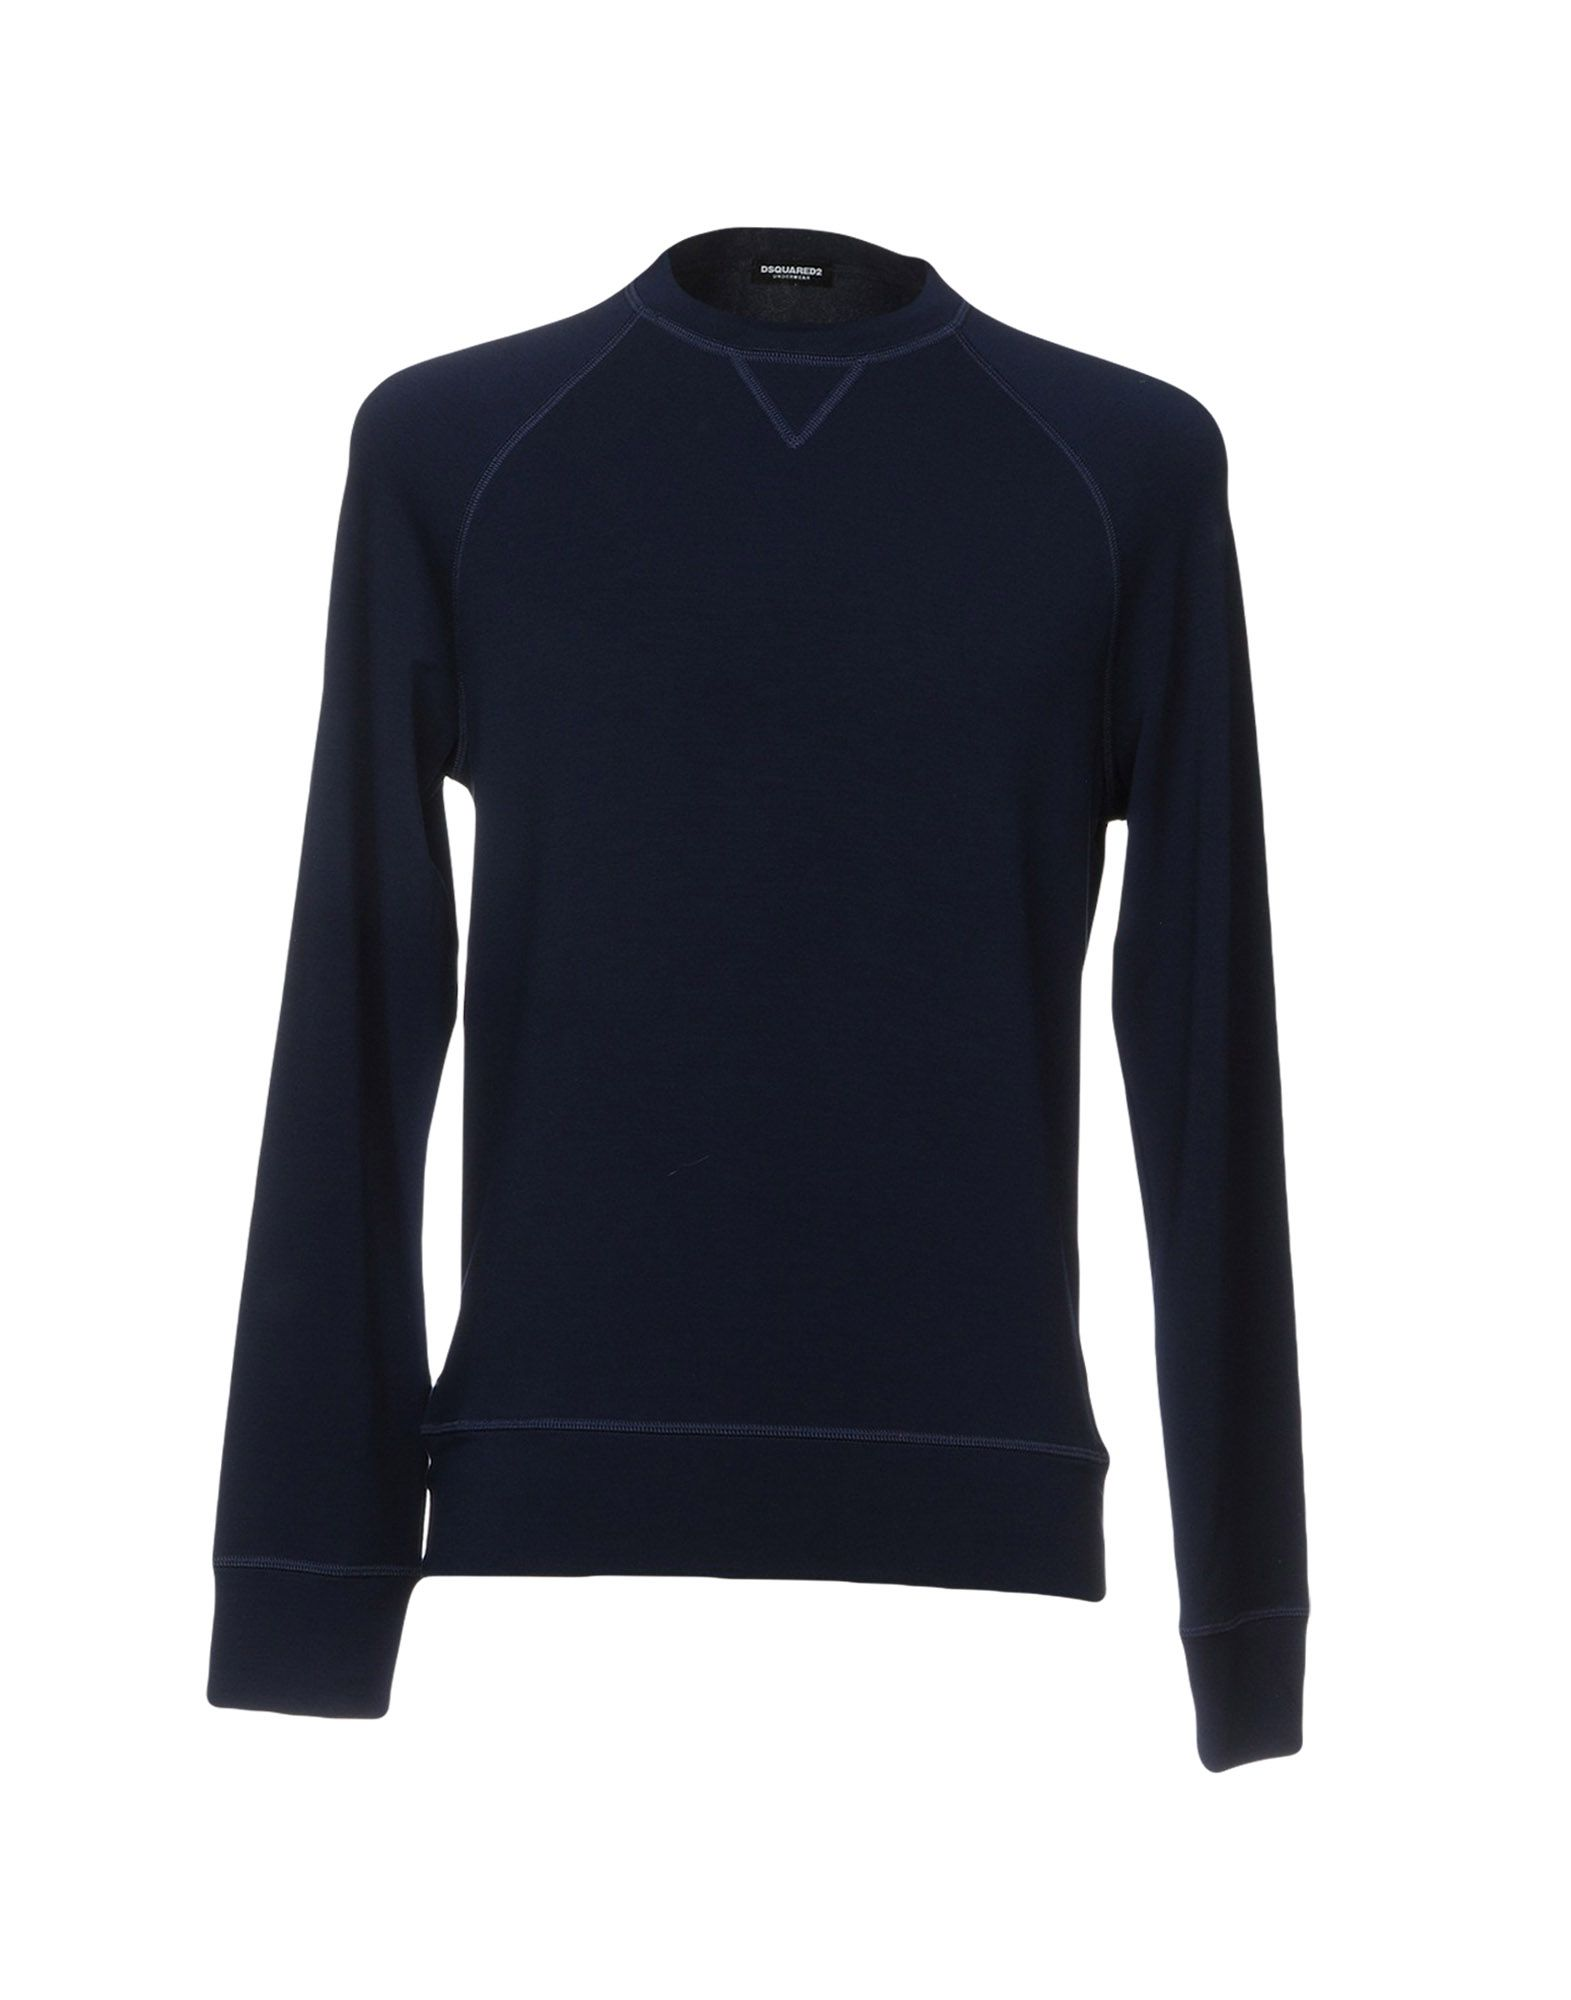 T-Shirt Intima Dsquared2 Uomo - Acquista online su